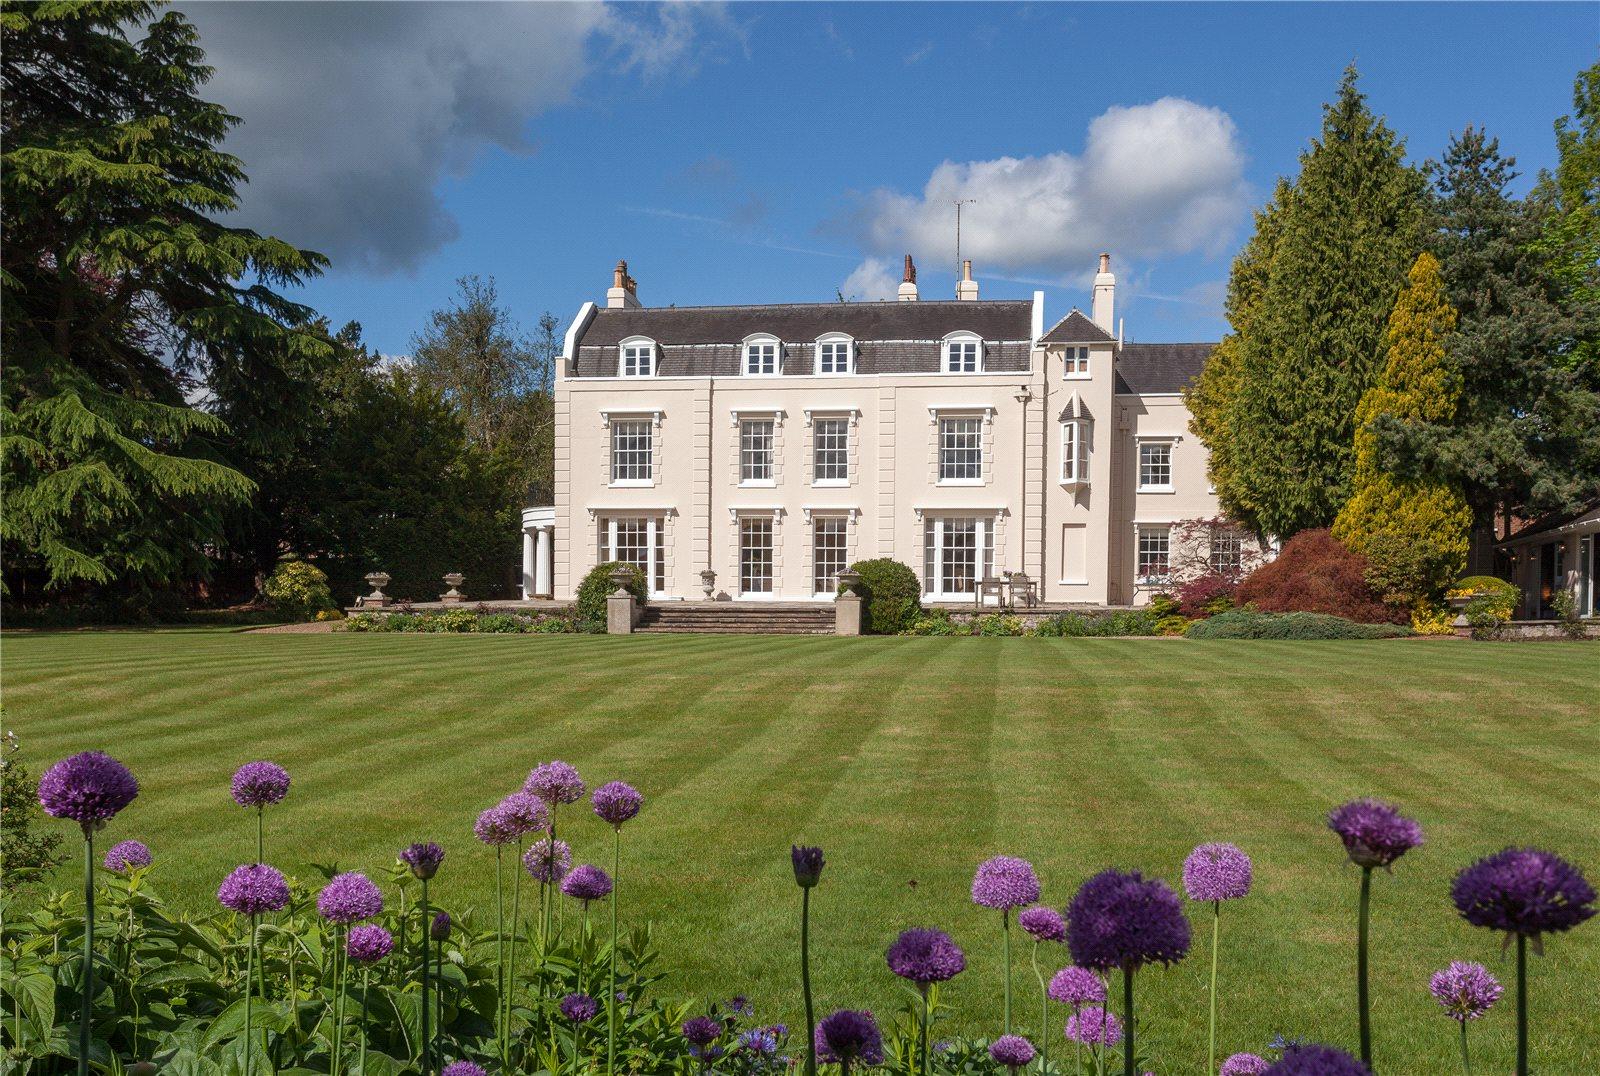 Single Family Home for Sale at Hadham Cross (Lot 1), Much Hadham, Hertfordshire, SG10 Much Hadham, England